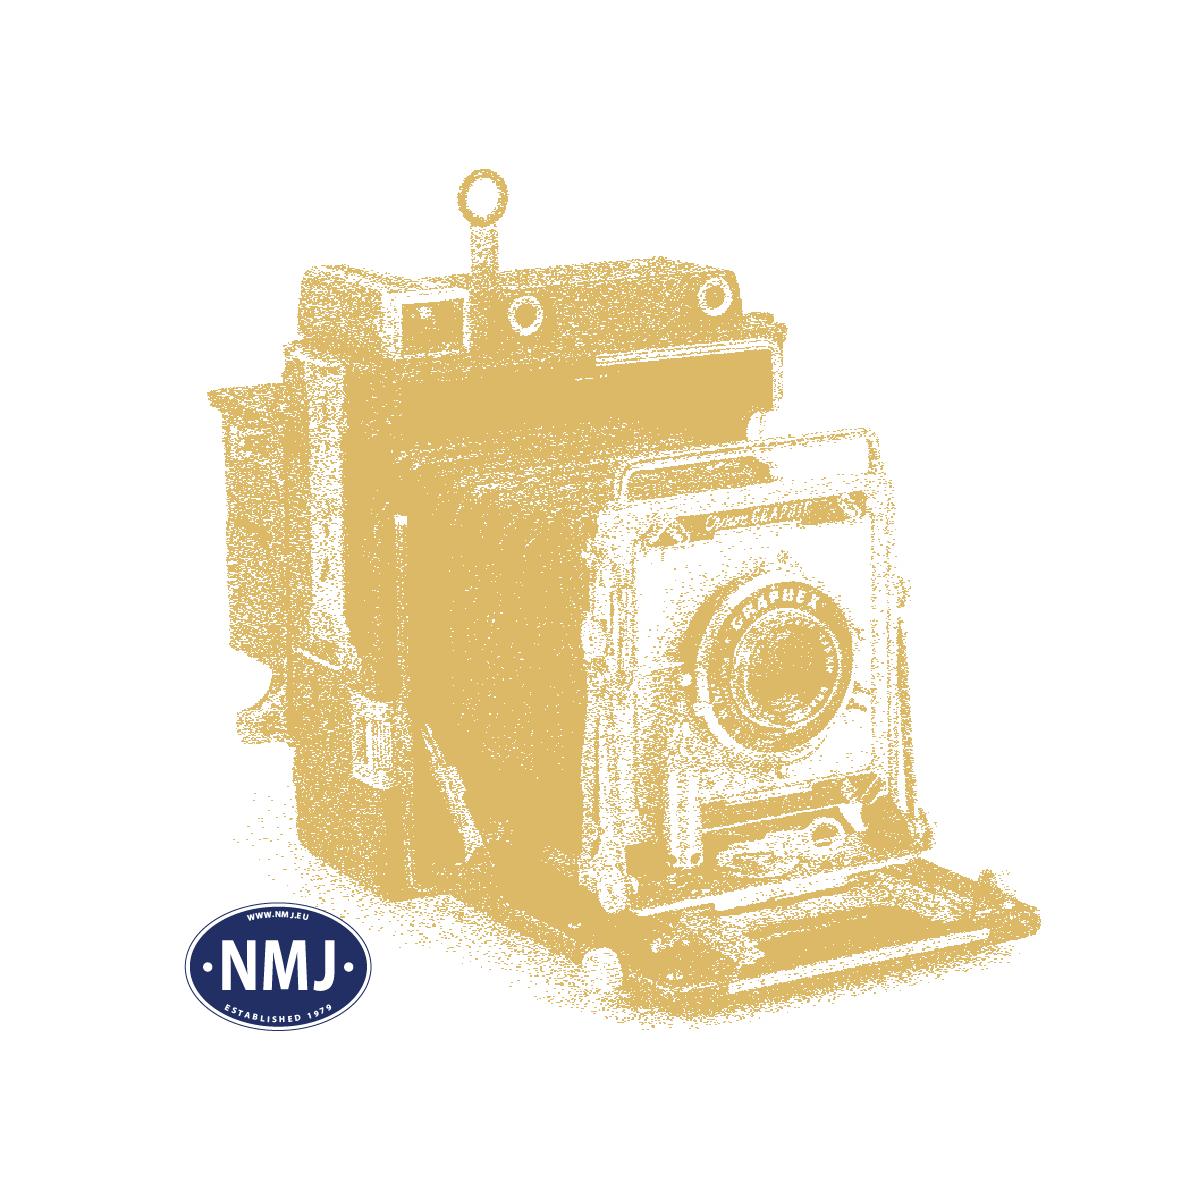 NMJT80.103 - NMJ Topline NSB EL17.2223, DC